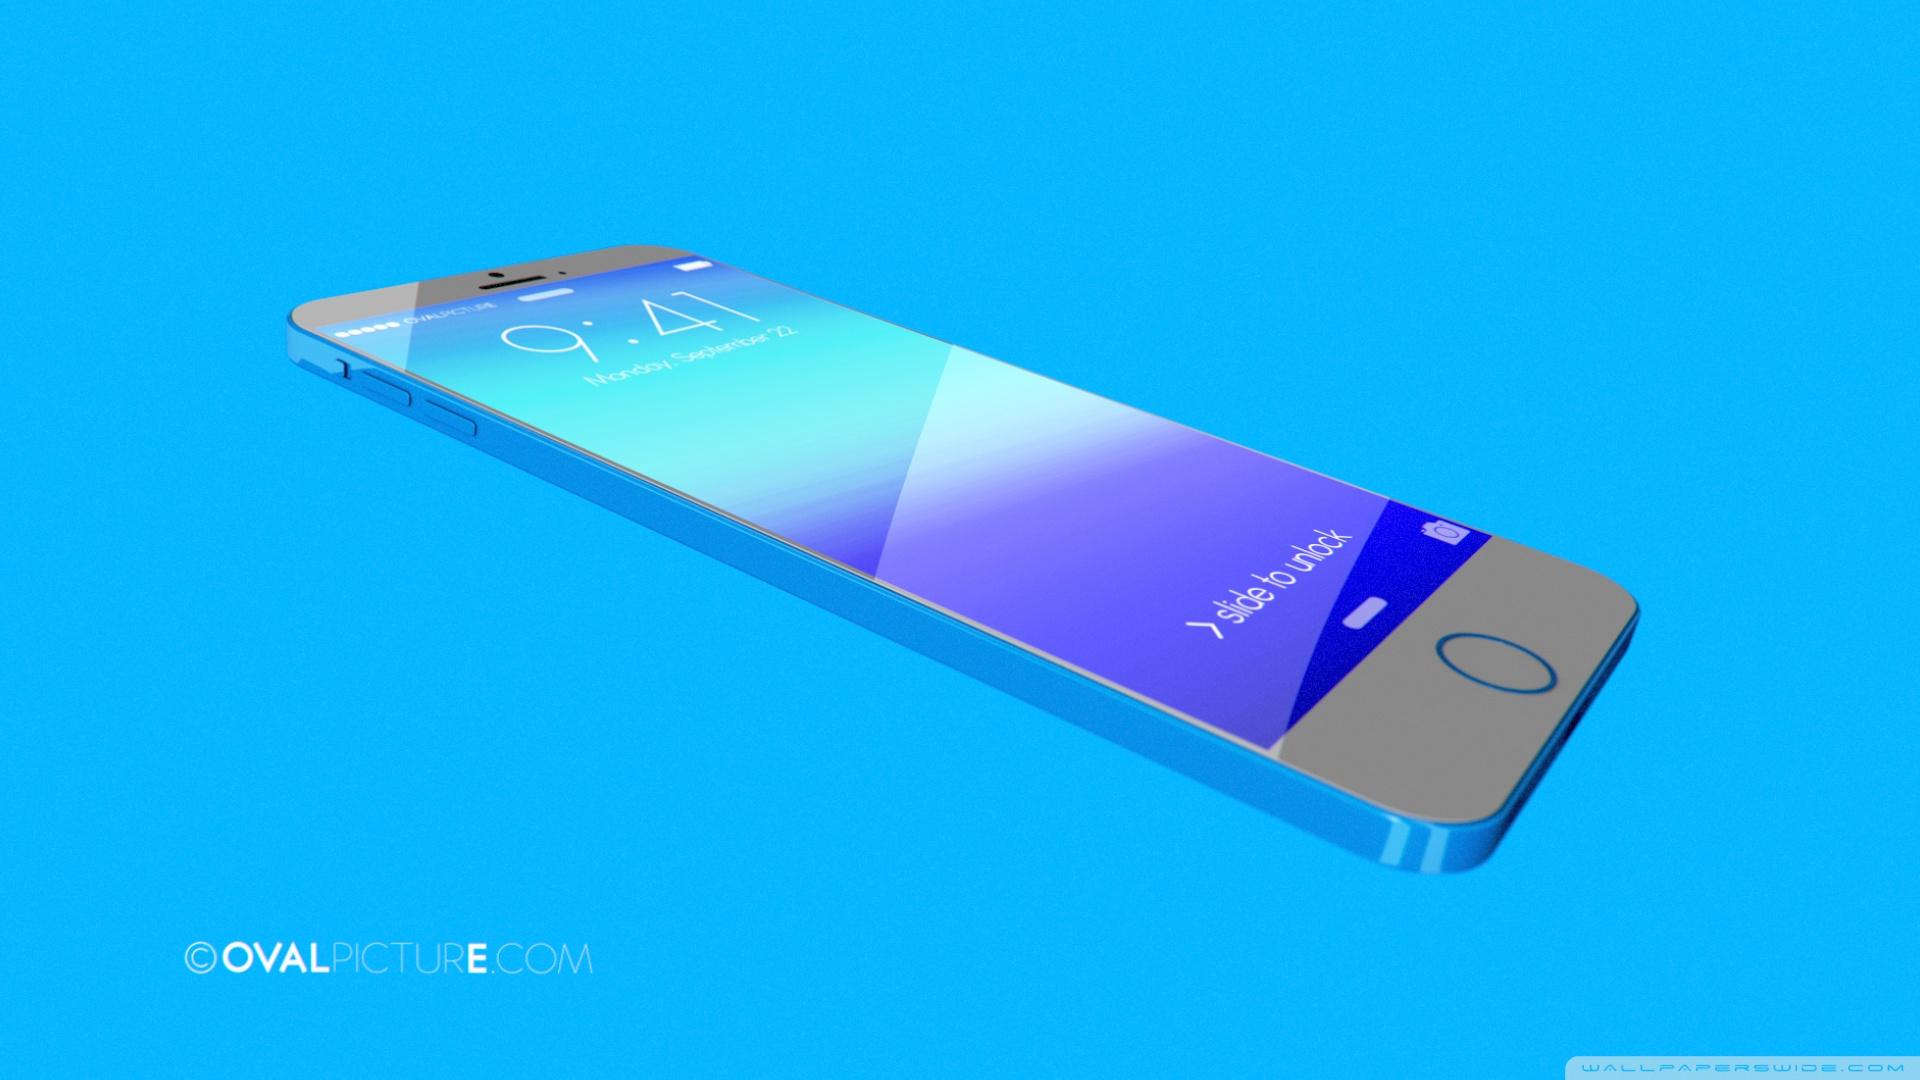 Cool Iphone S Wallpaper 1920x1080 55934